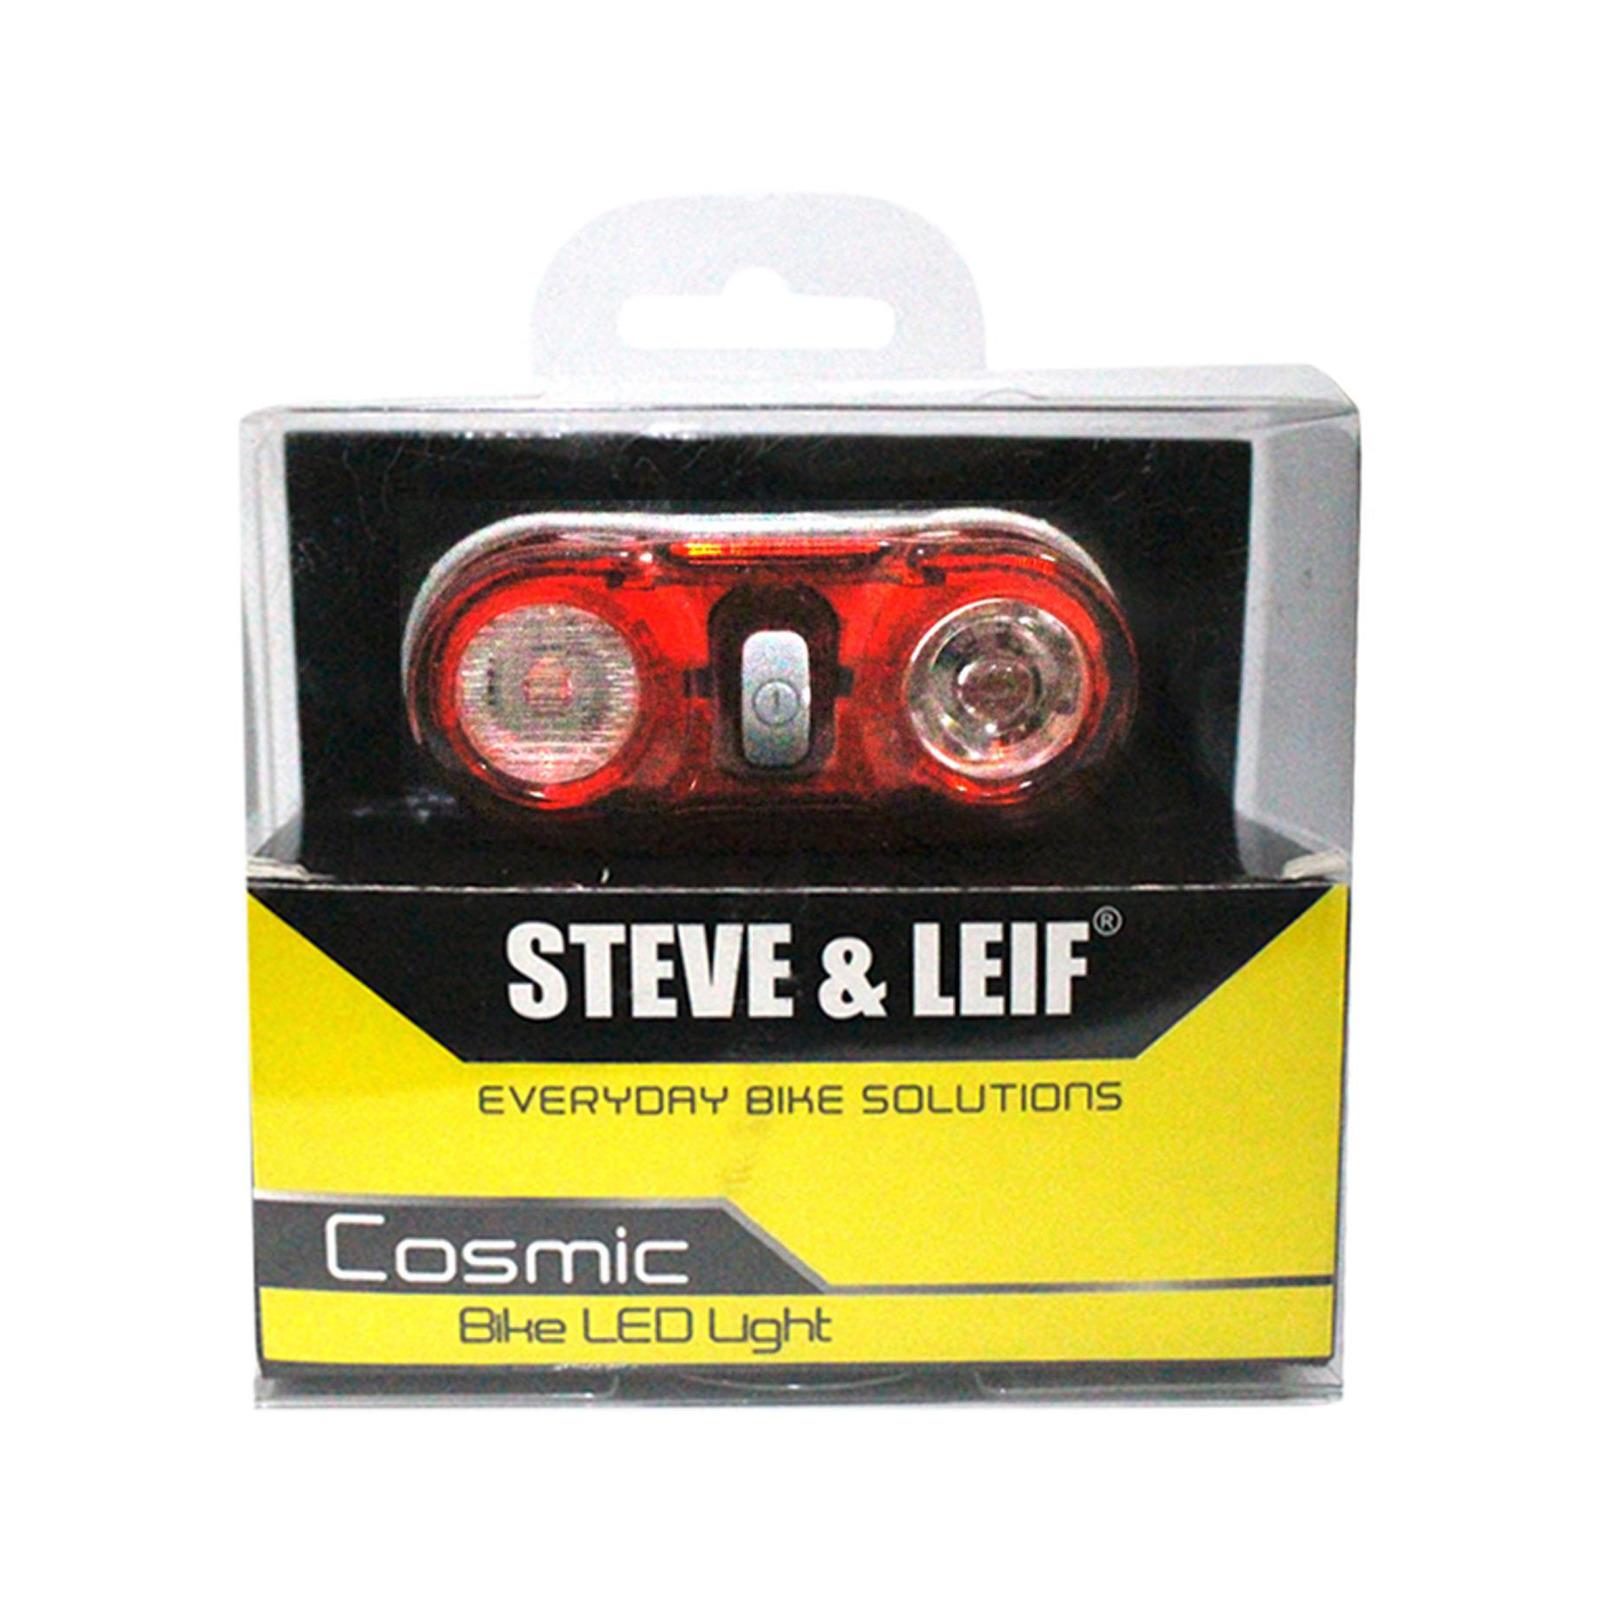 Steve & Leif Cosmic 0.5 Watt LED Red Bicycle TorcH